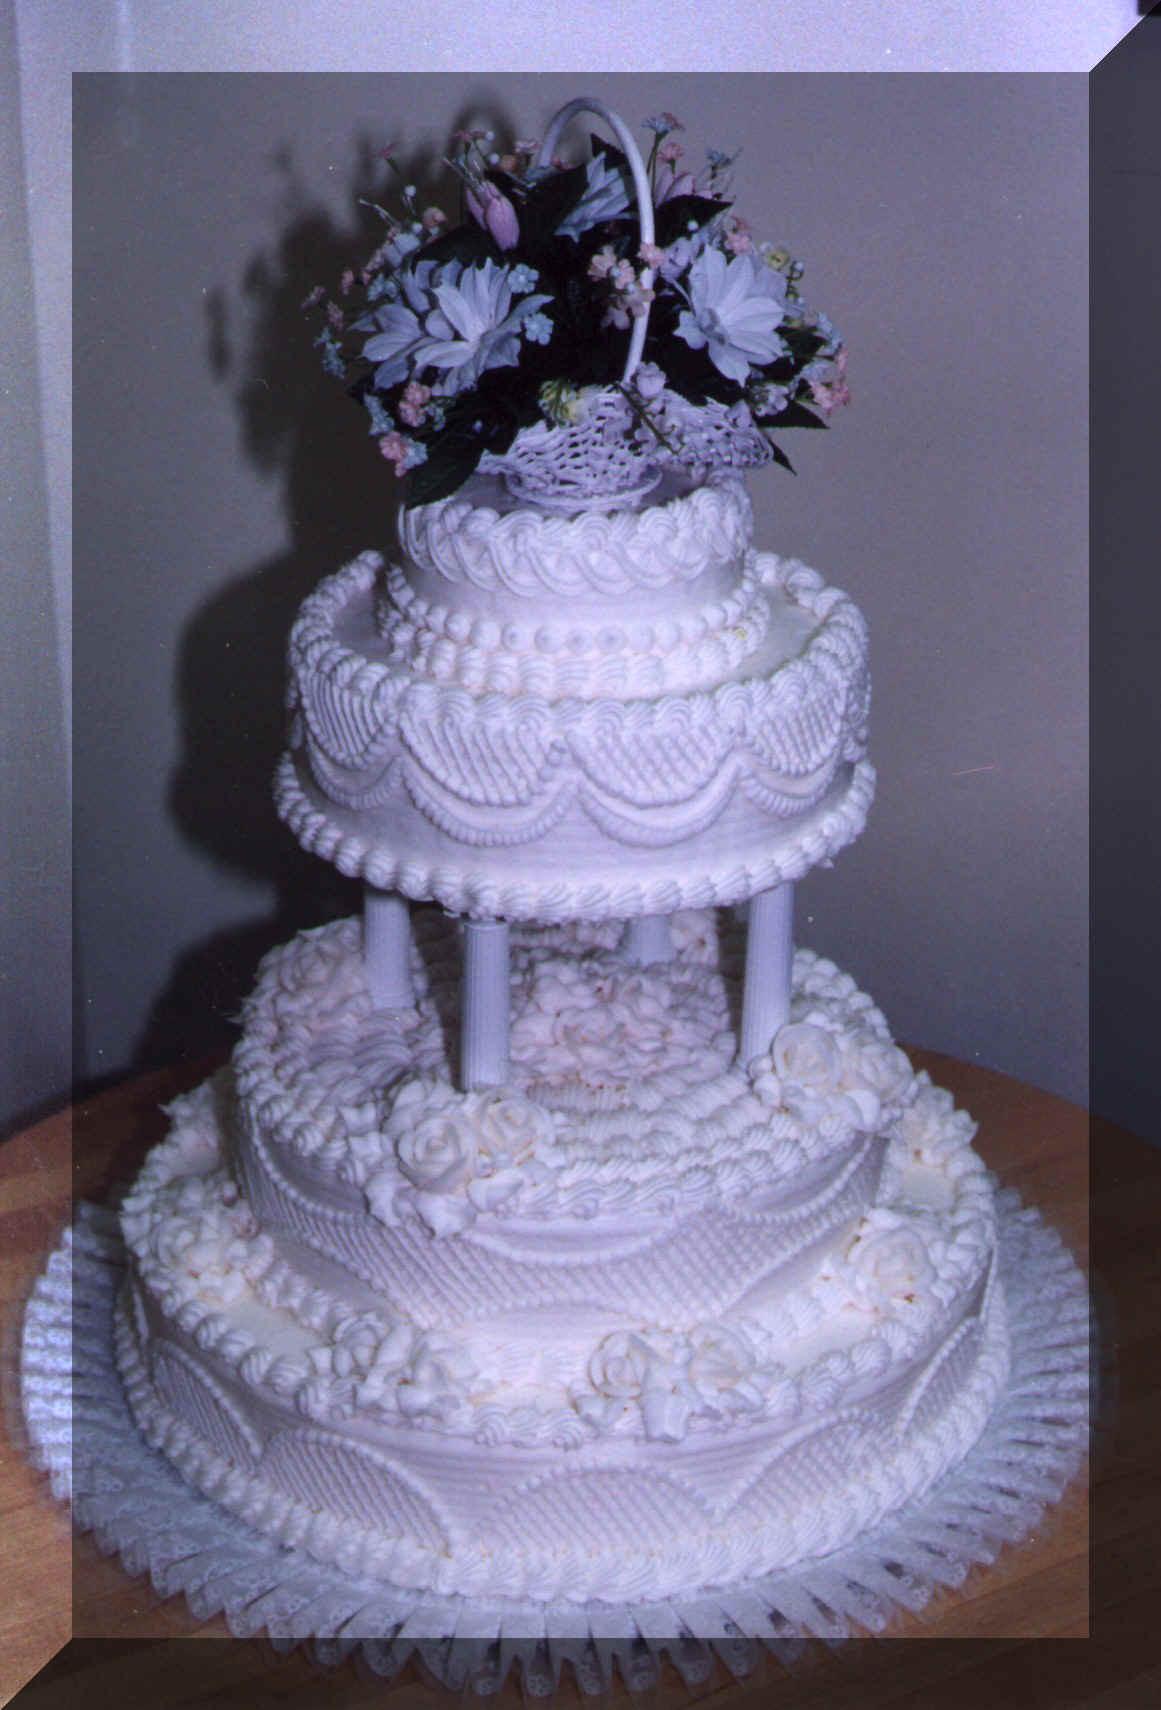 Wedding Cakes Walmart  Walmart Wedding Cake Prices